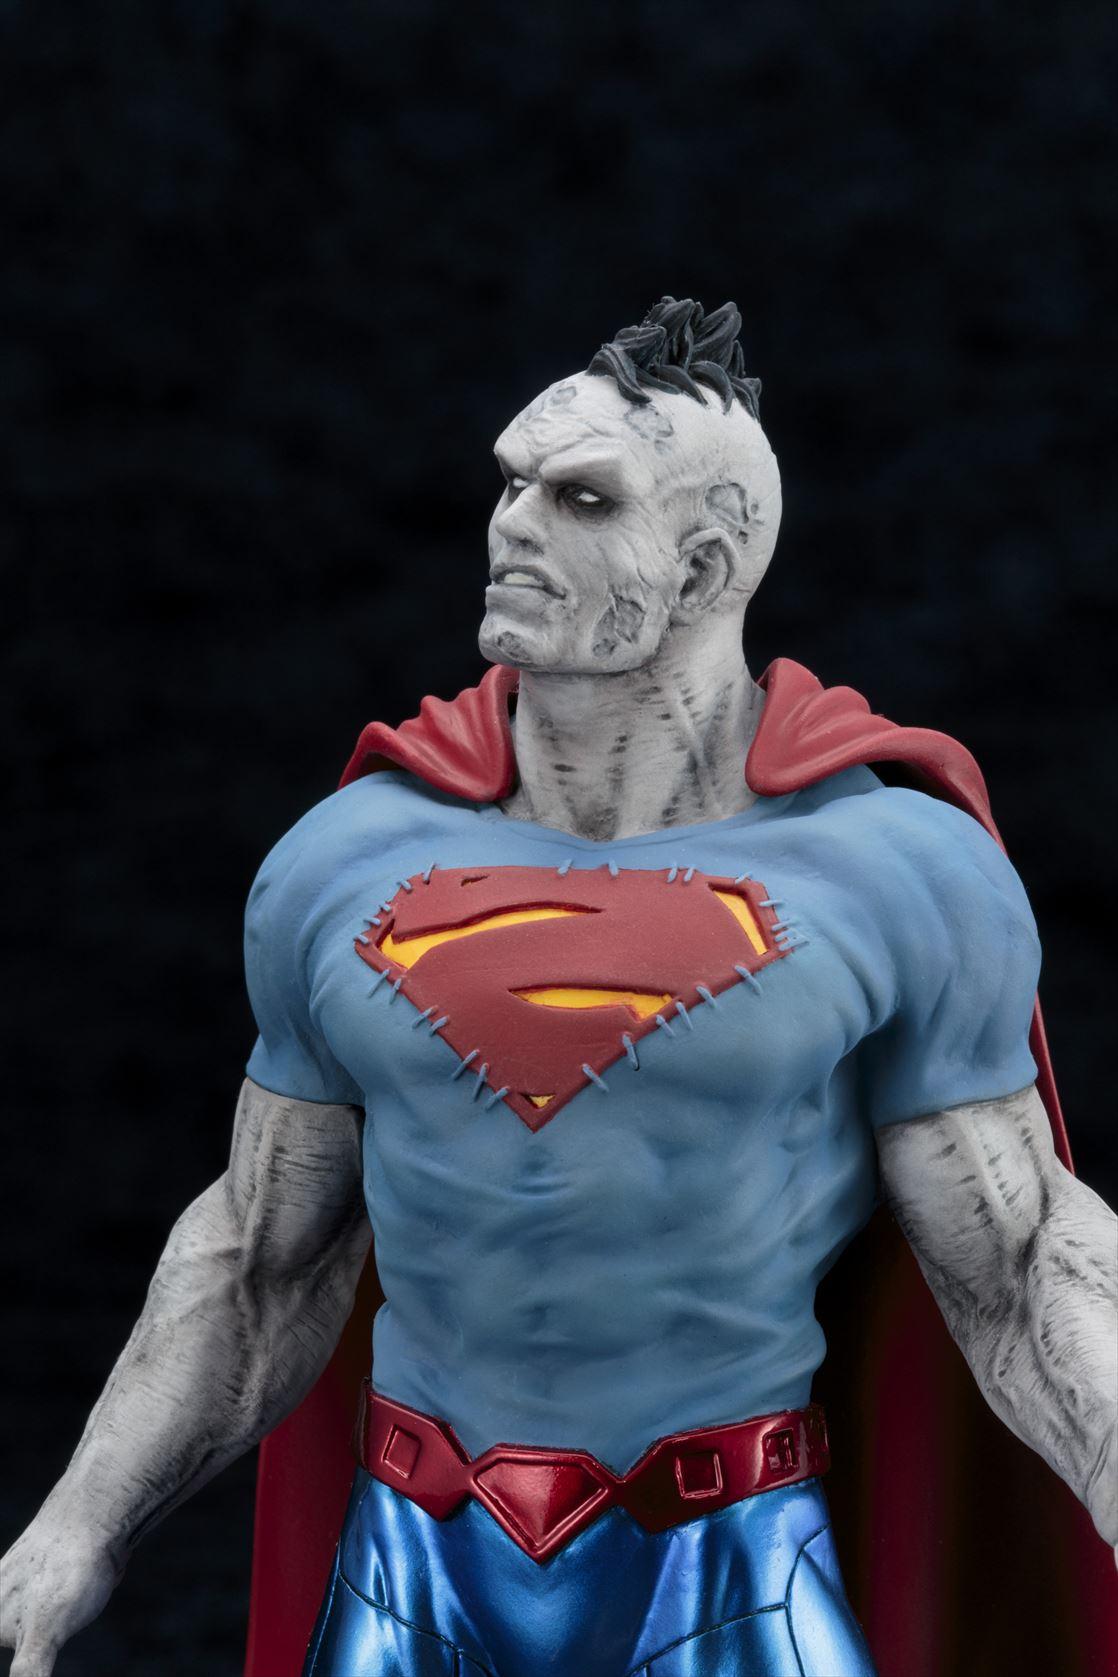 「ARTFX+ DC COMICS NEW52!」悪役シリーズ第 4 弾! スーパーマンのクローン「ビザロ」が登場!